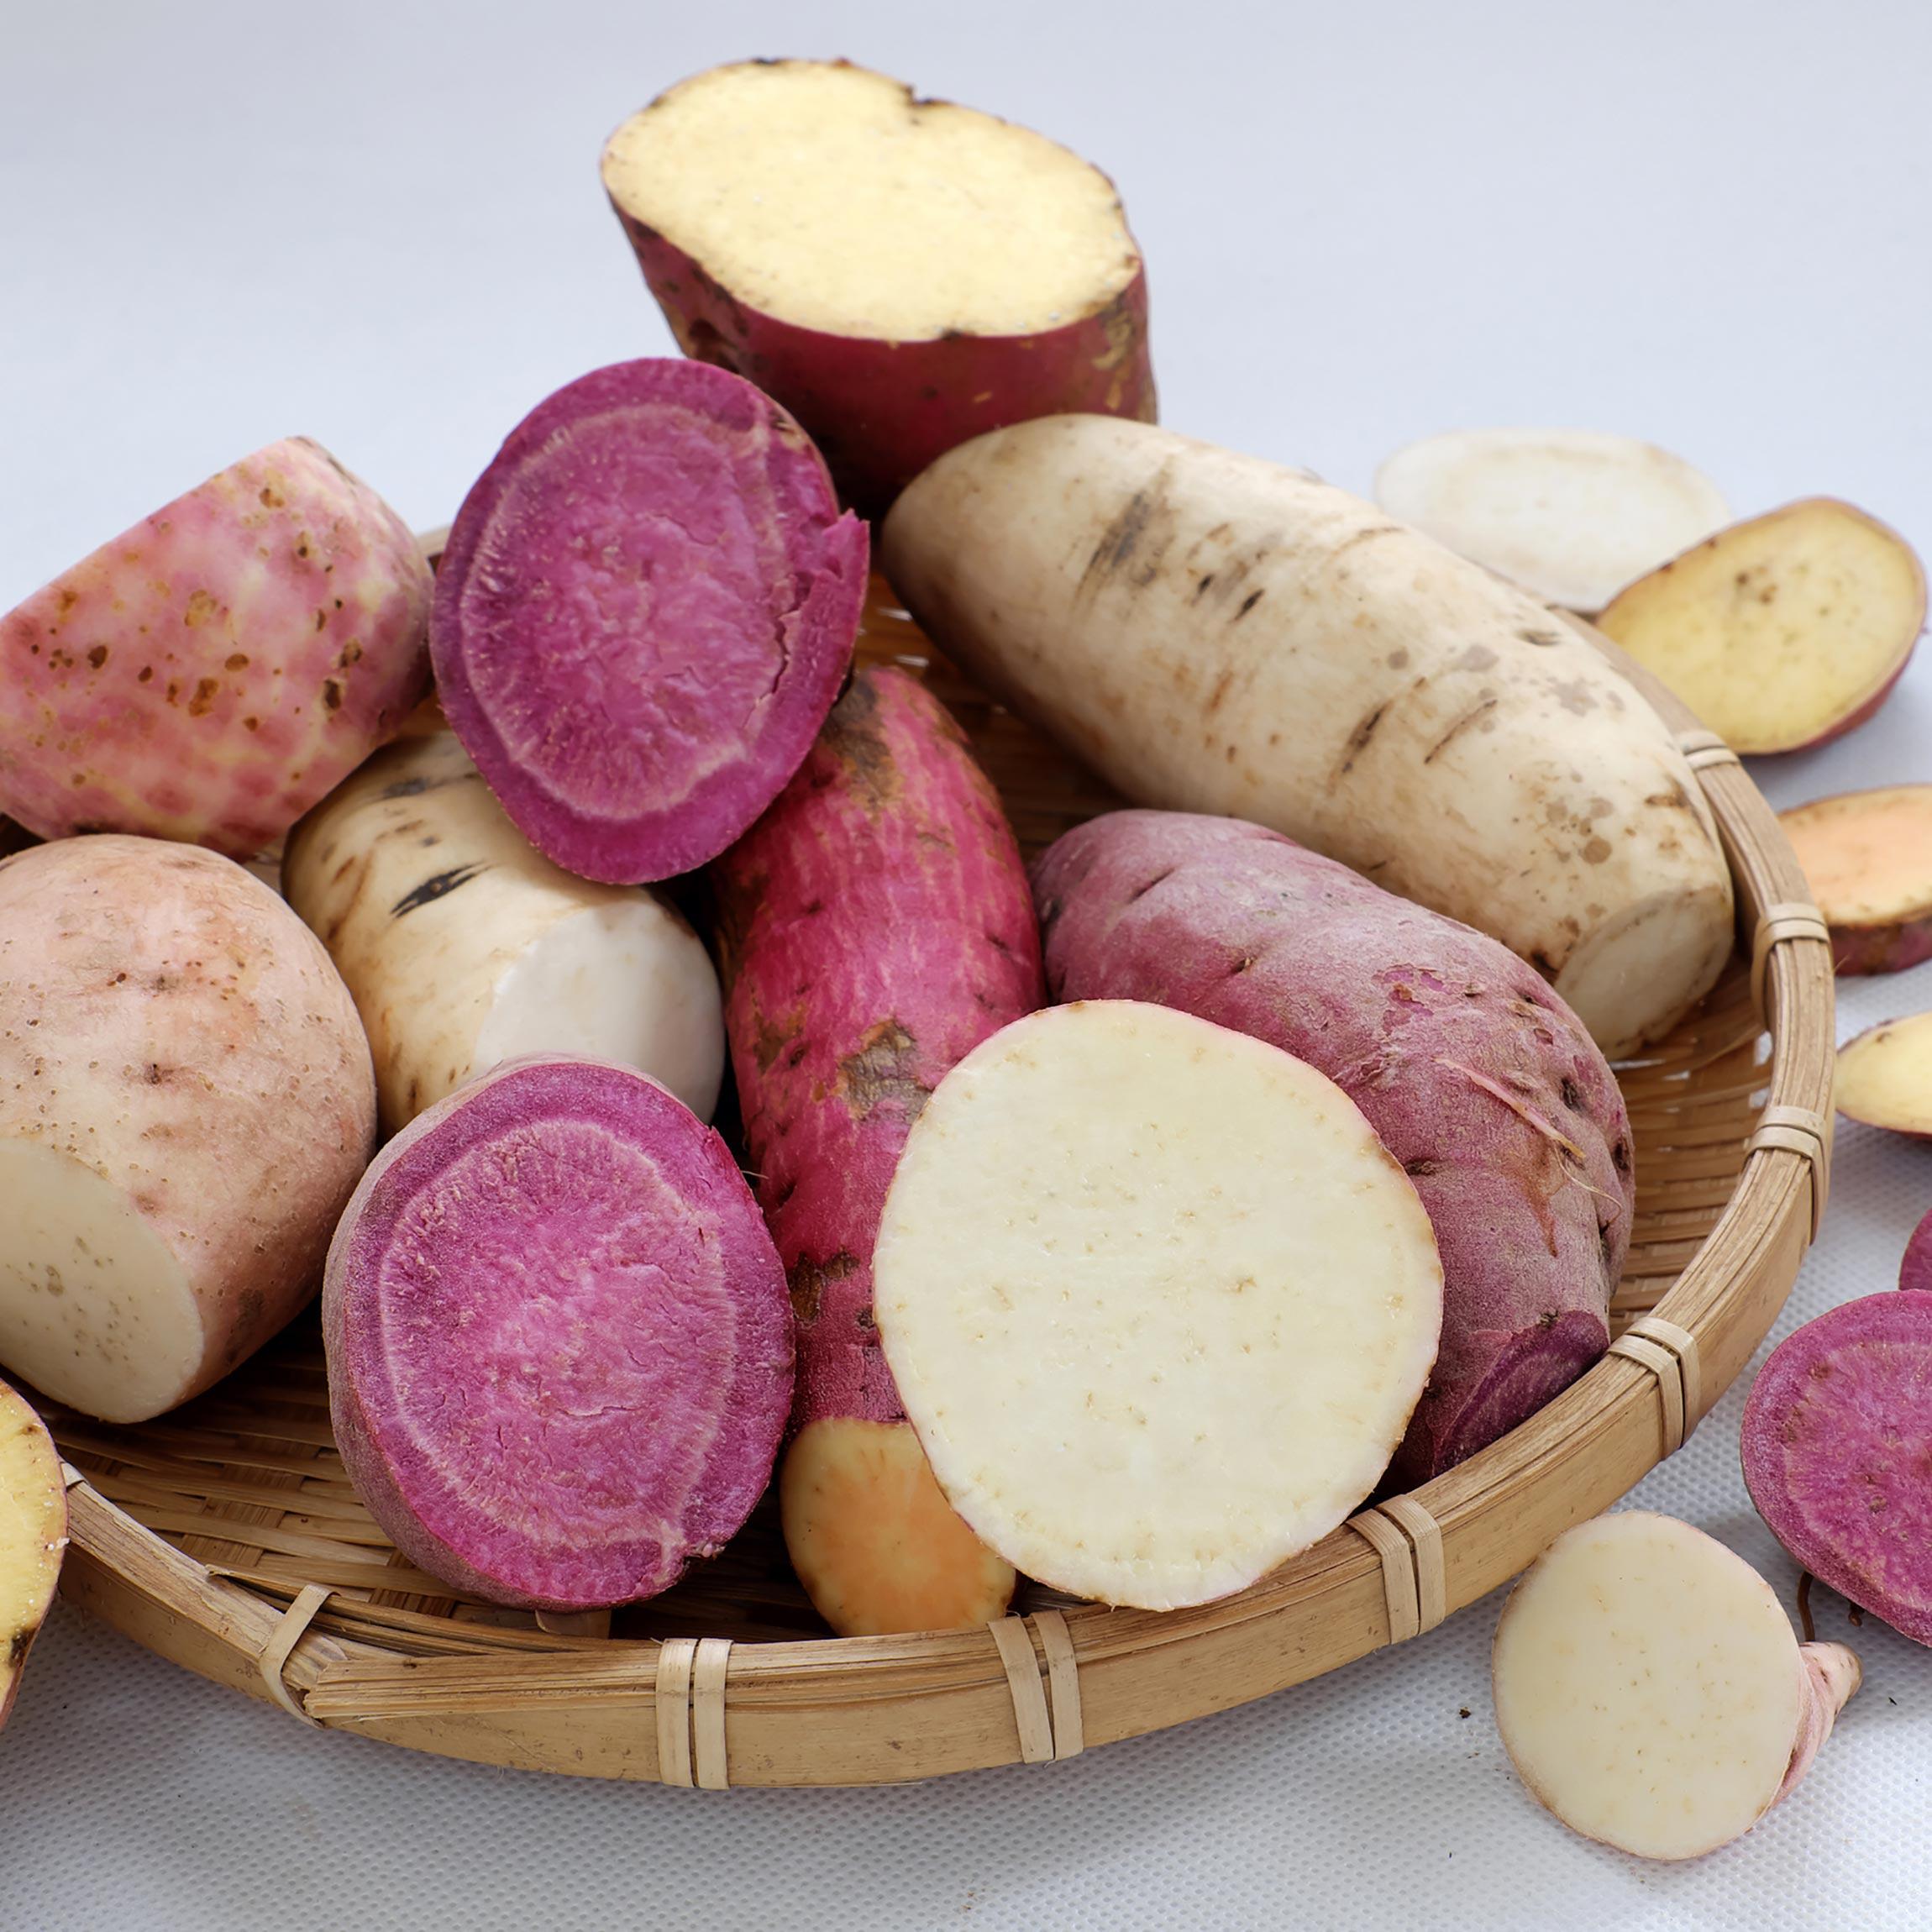 Sweet Potato Health Benefits: 10 Reasons To Eat More Sweet